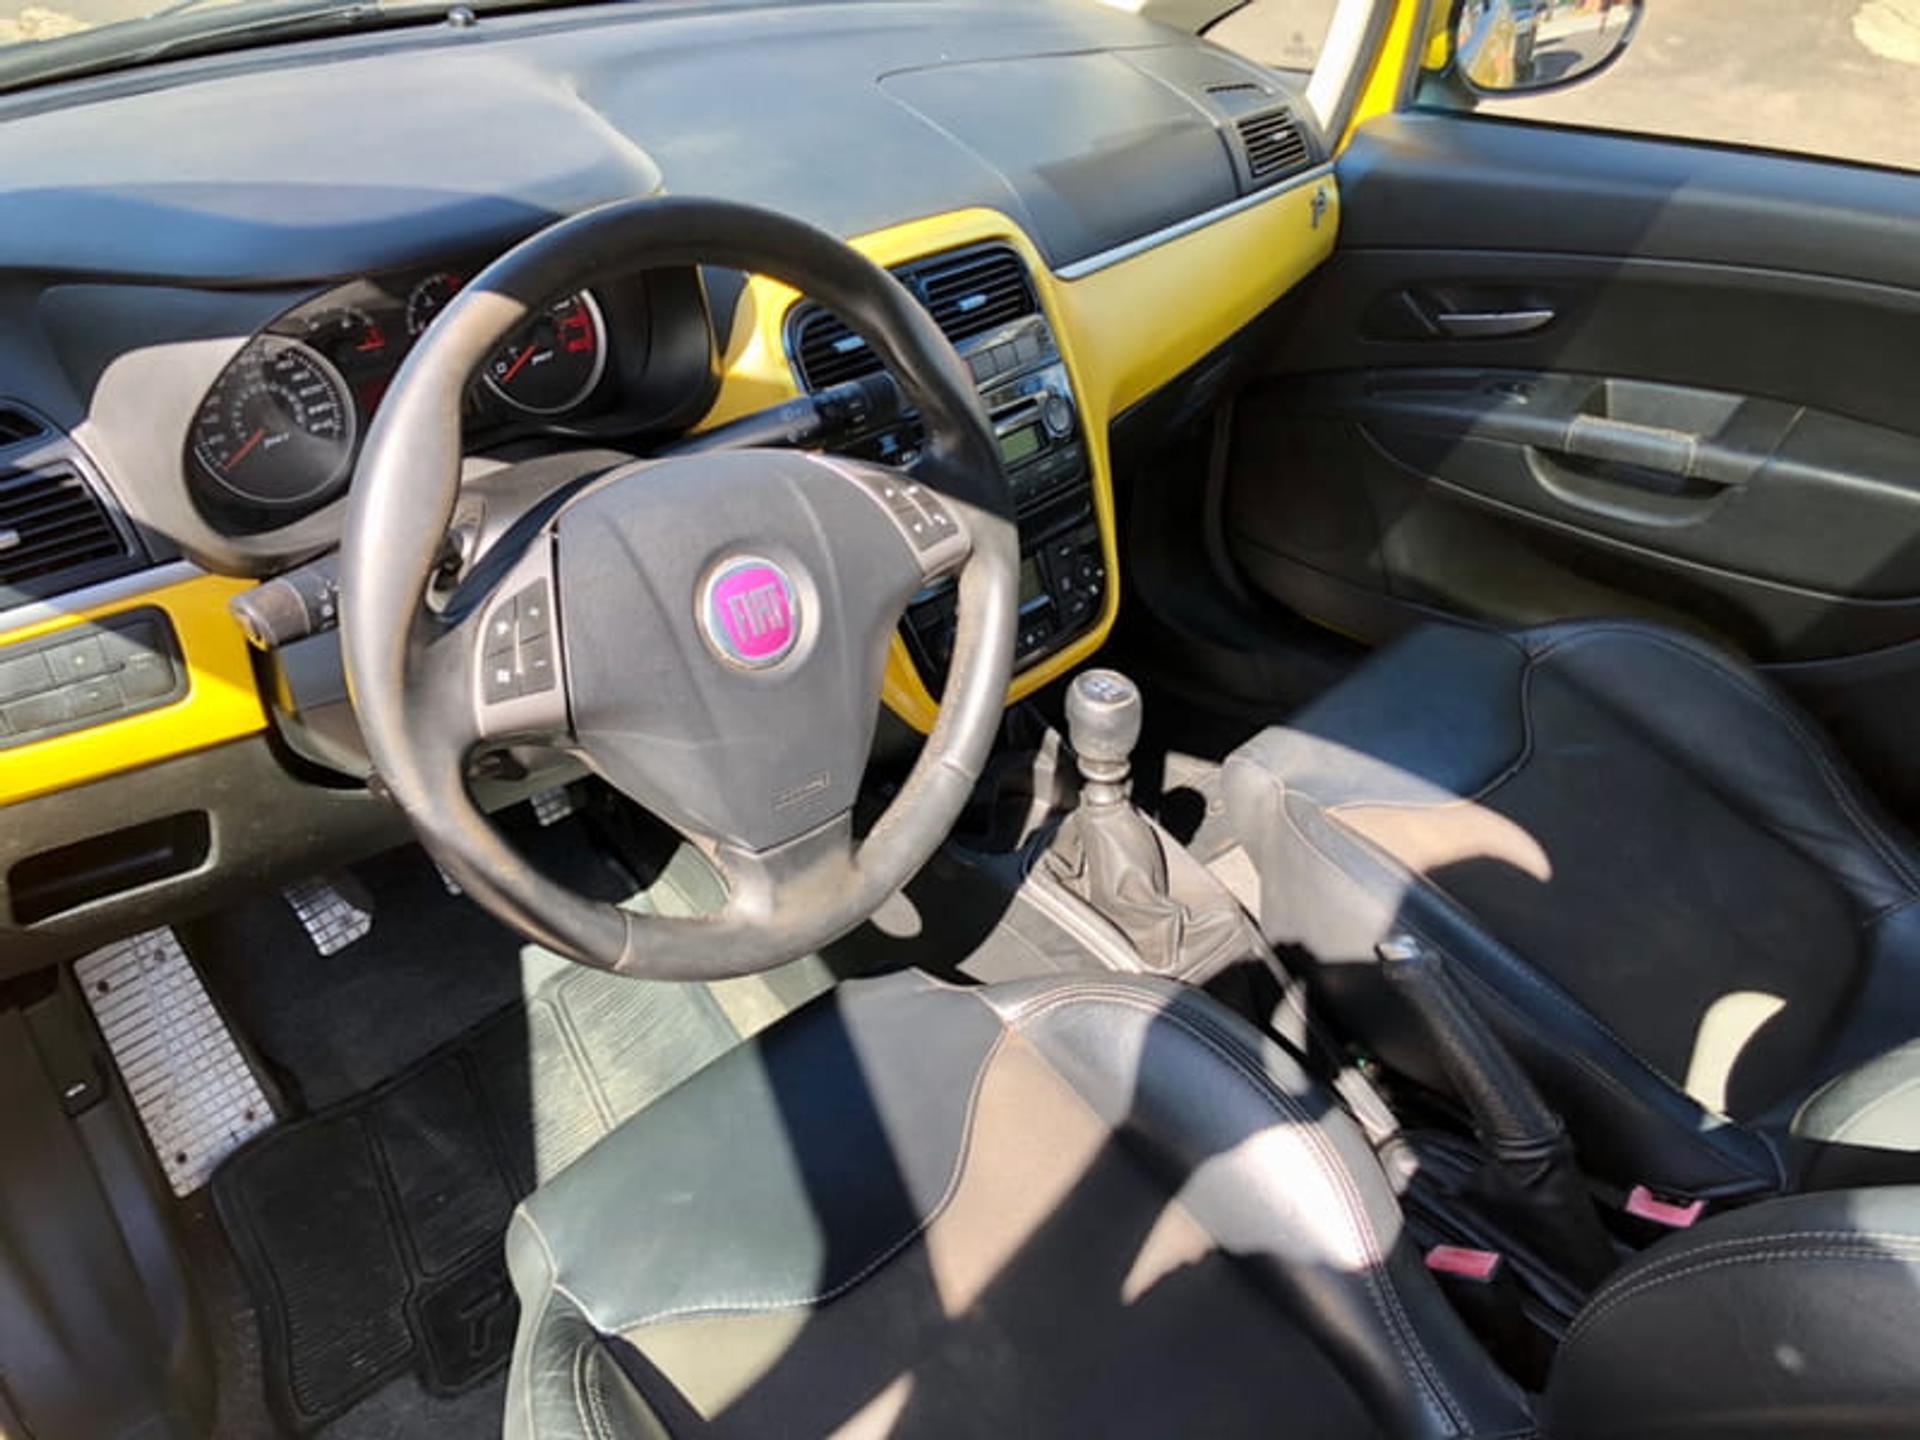 Fiat Punto 1.4 Mpi 16v Tjet Gasolina 4p Manual Wmimagem1429391471